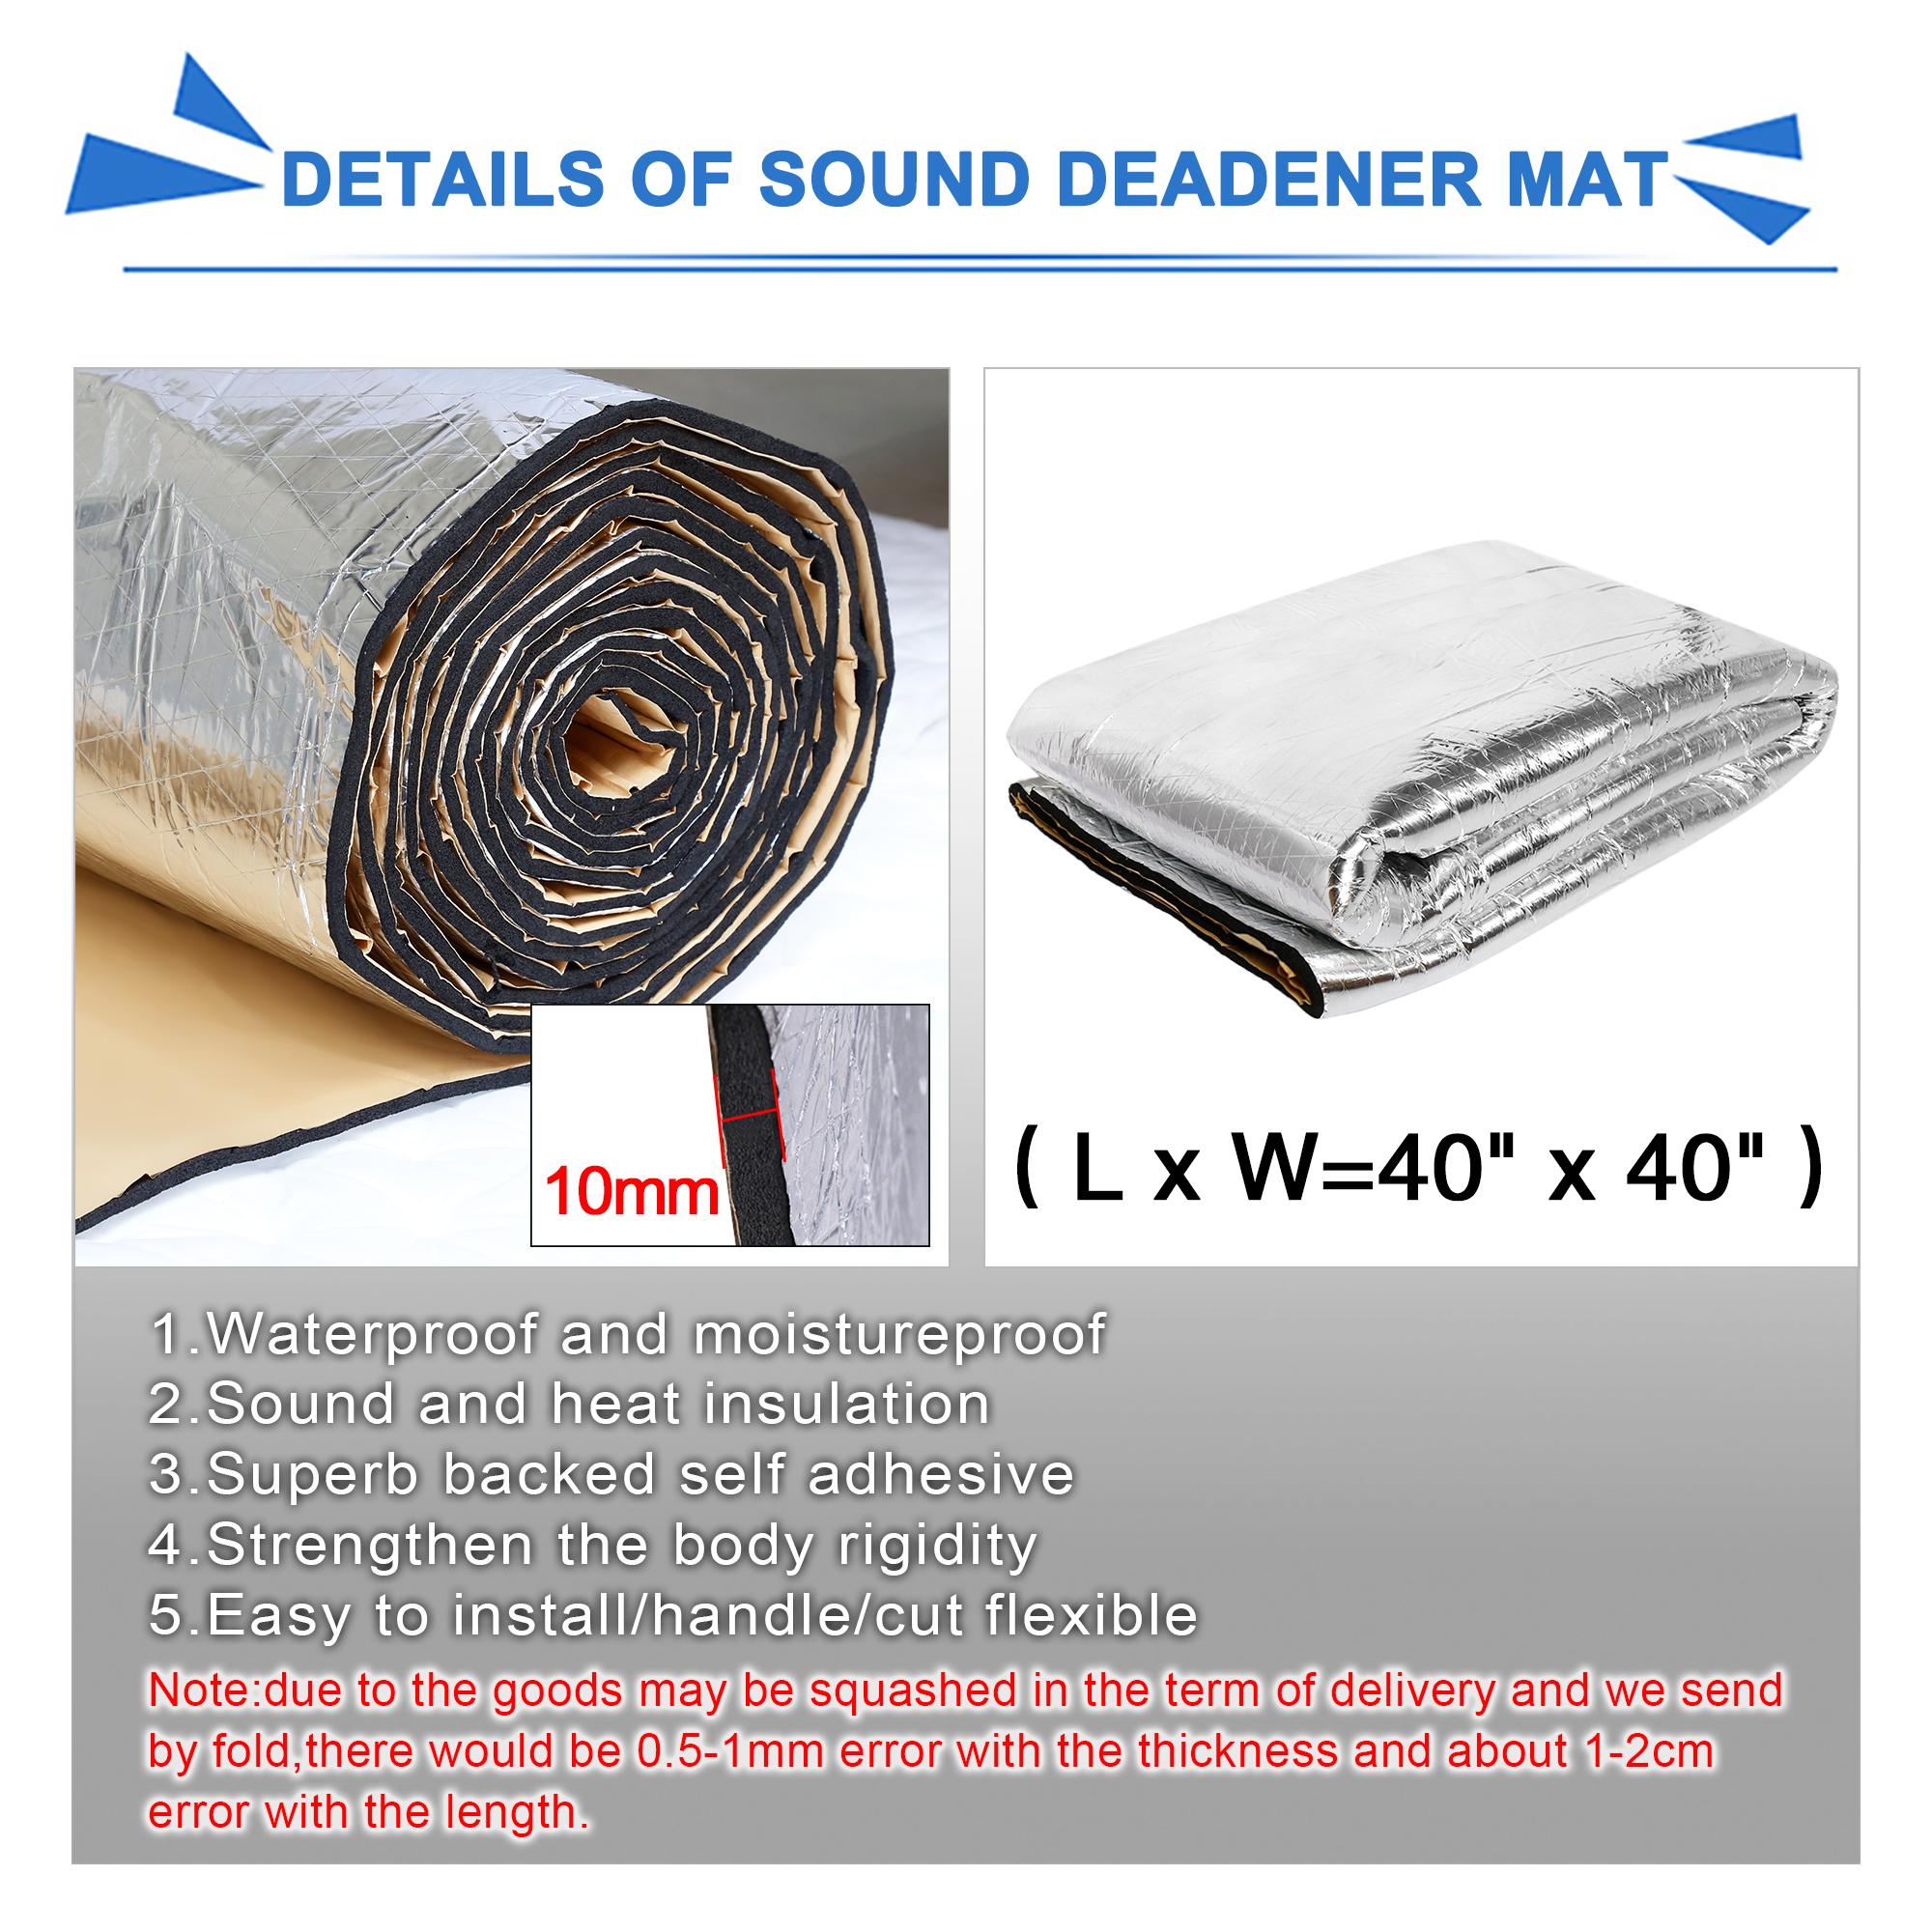 1mx1m 10mm car hood door heat sound deadener reducer insulation underlay mat aud. Black Bedroom Furniture Sets. Home Design Ideas